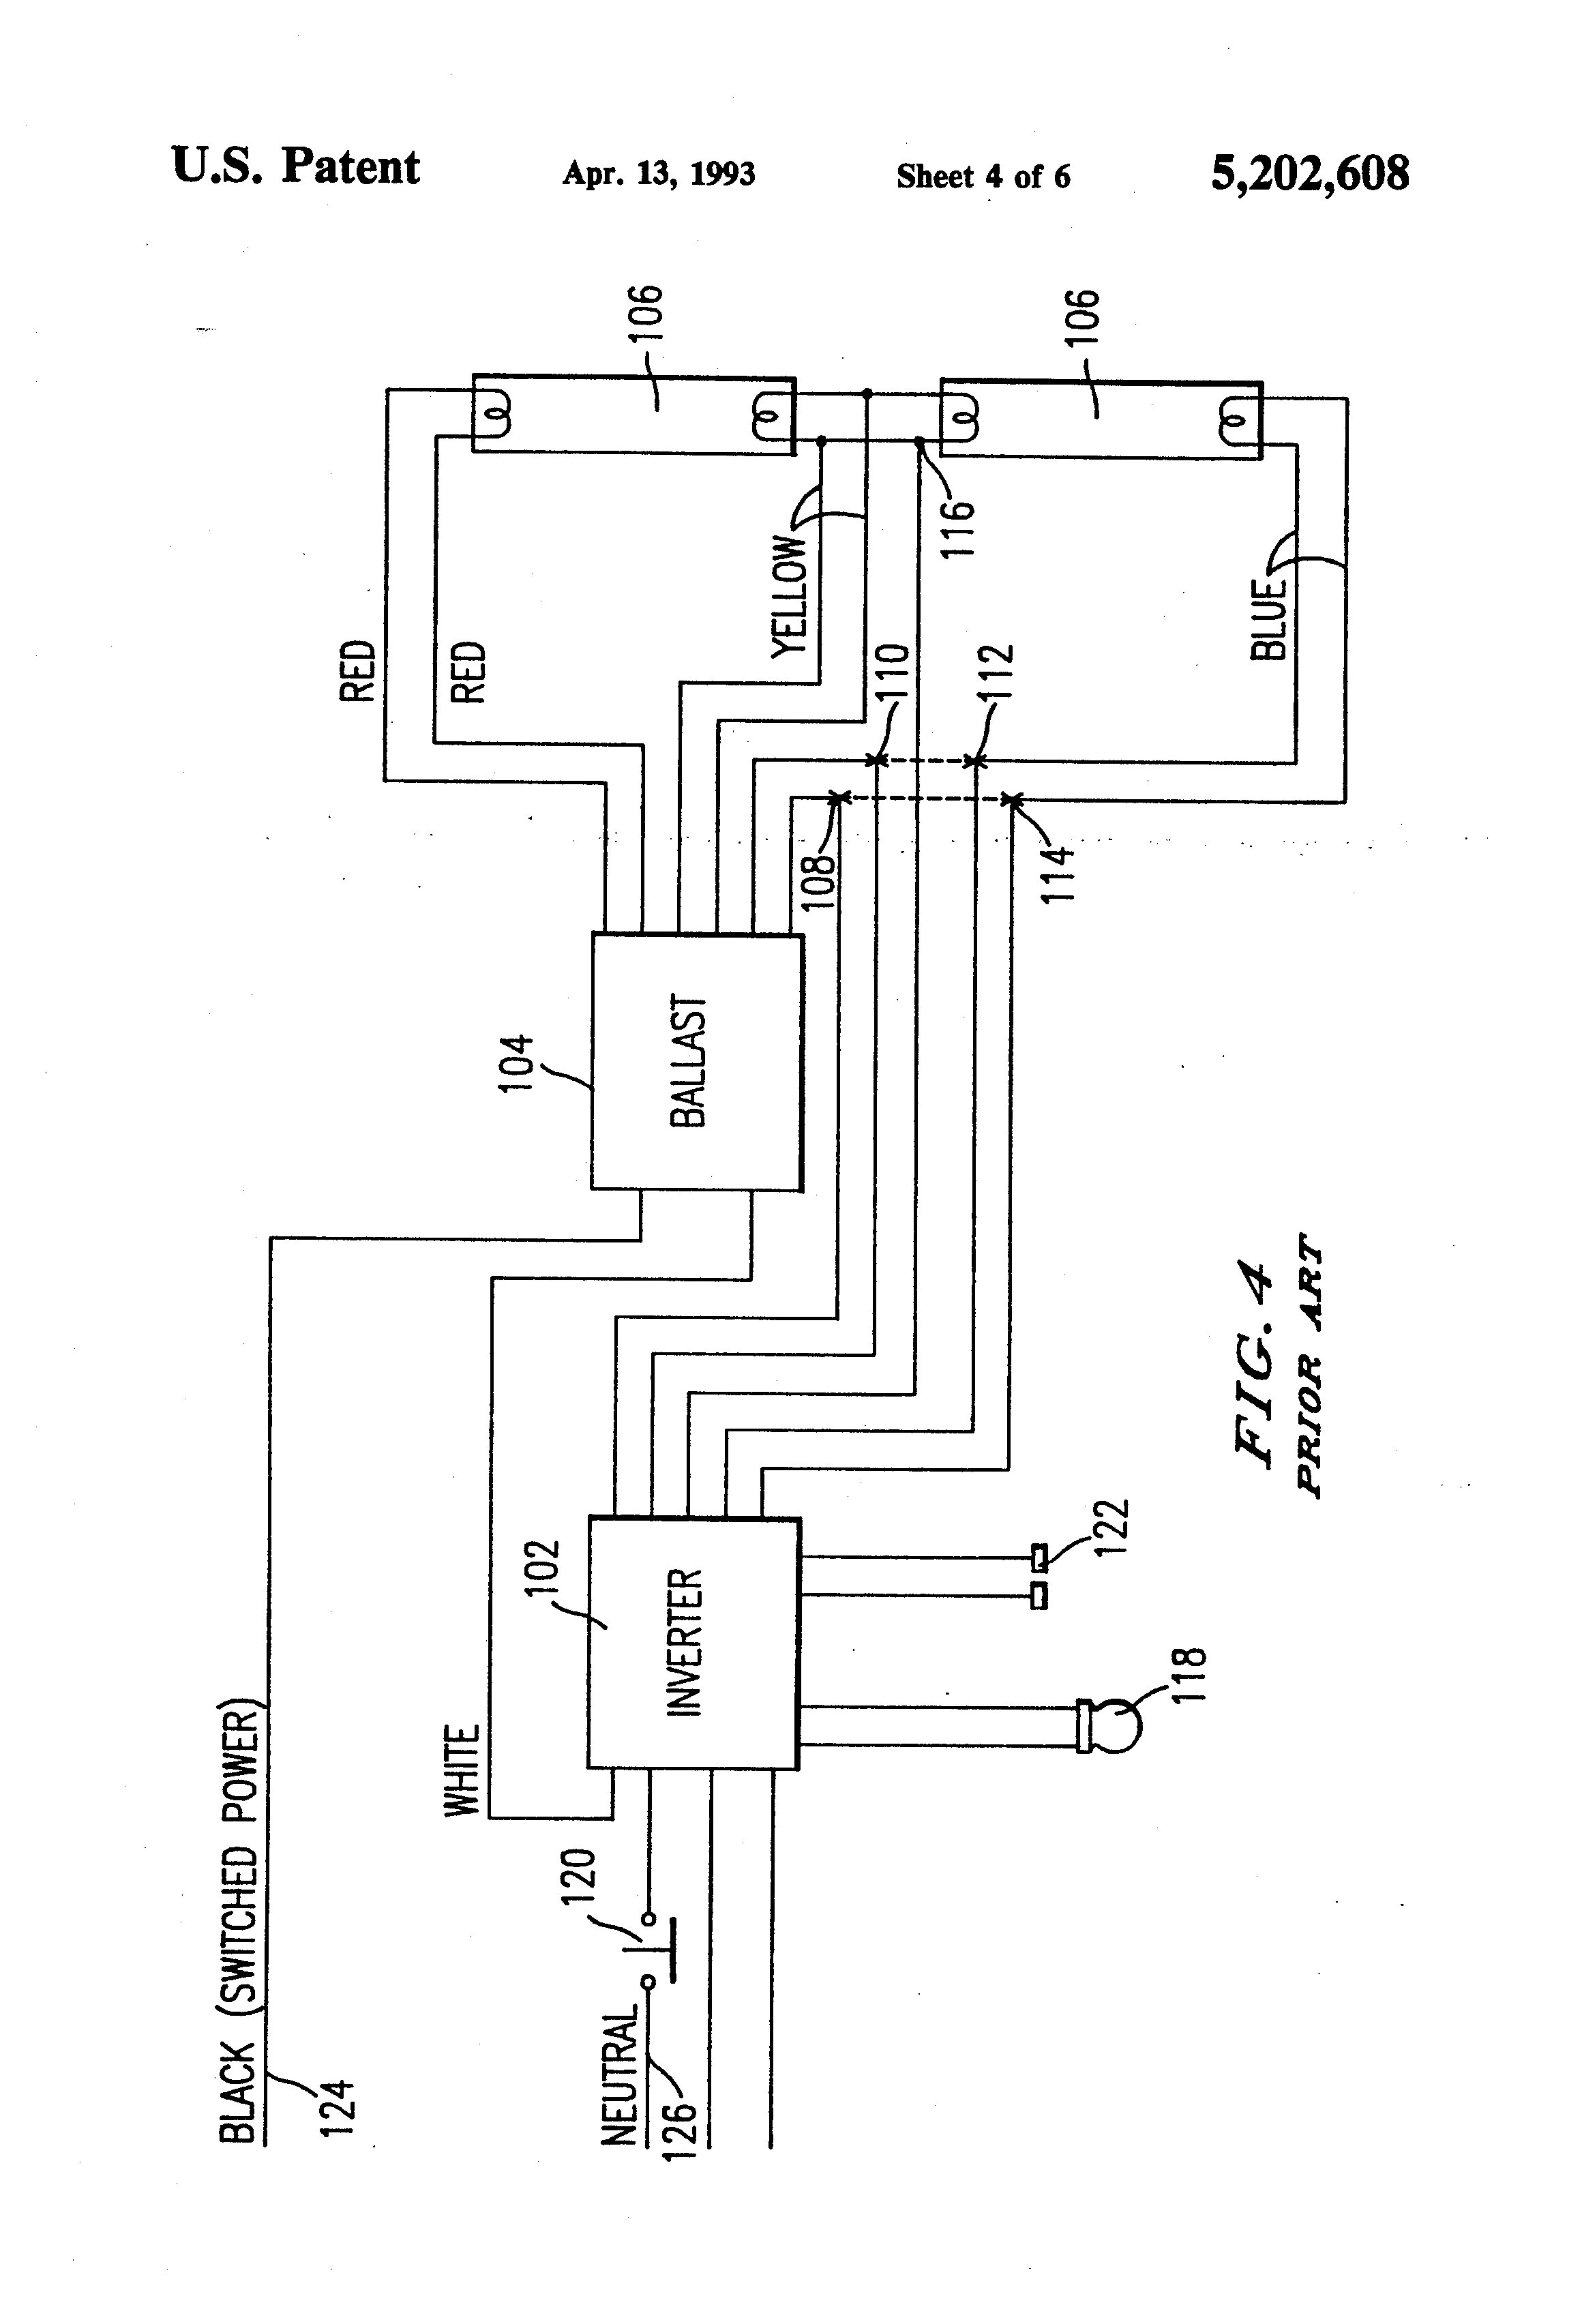 Electronic Choke Wiring Diagram Ey 3029] Hid Philips Advance Ballast Wiring Diagram Wiring Of Electronic Choke Wiring Diagram